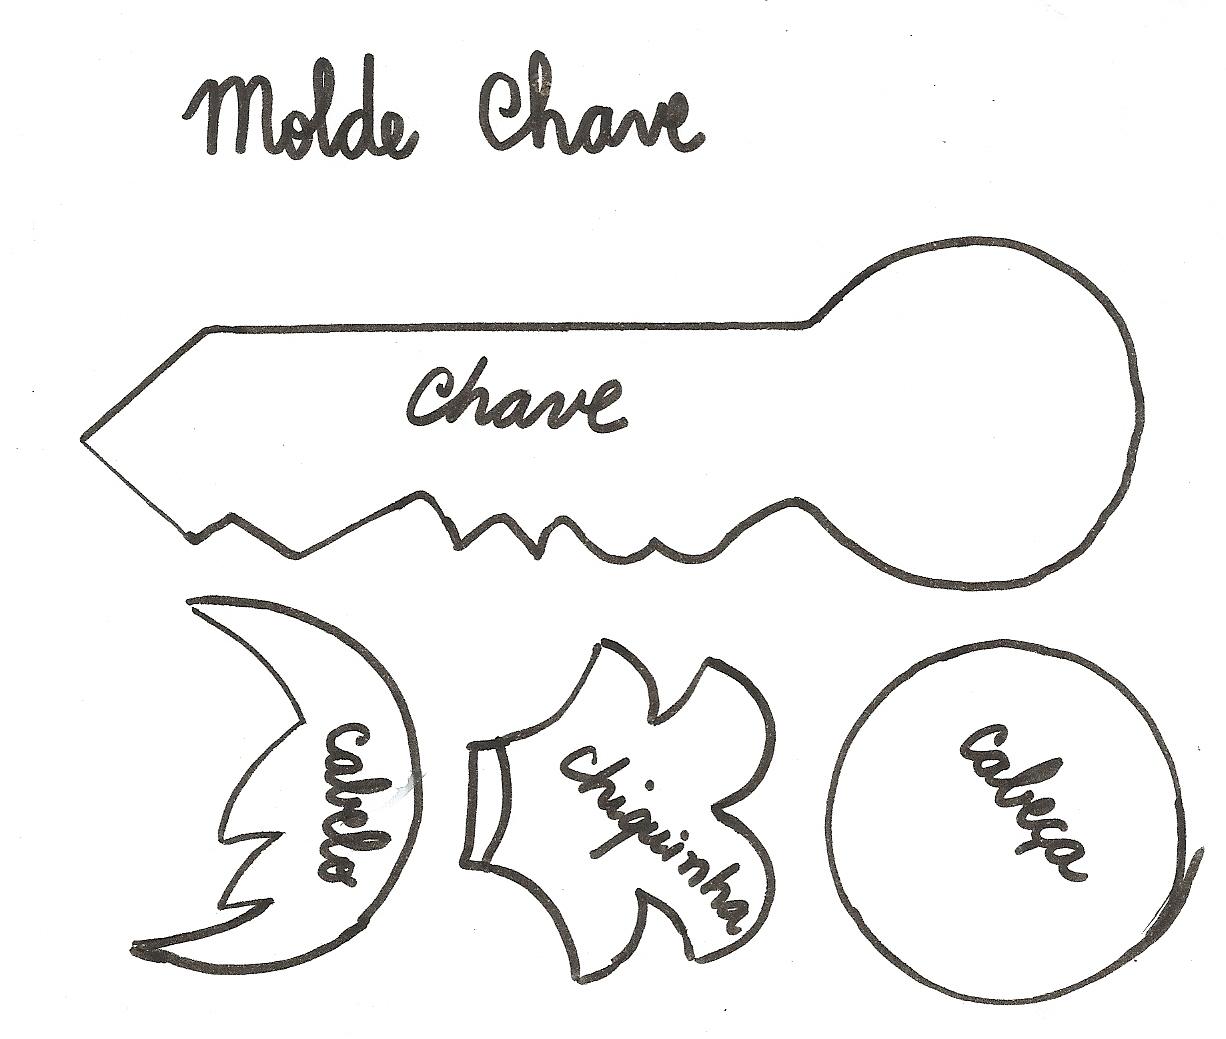 dibujos para colorear de skate dibujos para colorear imagixs